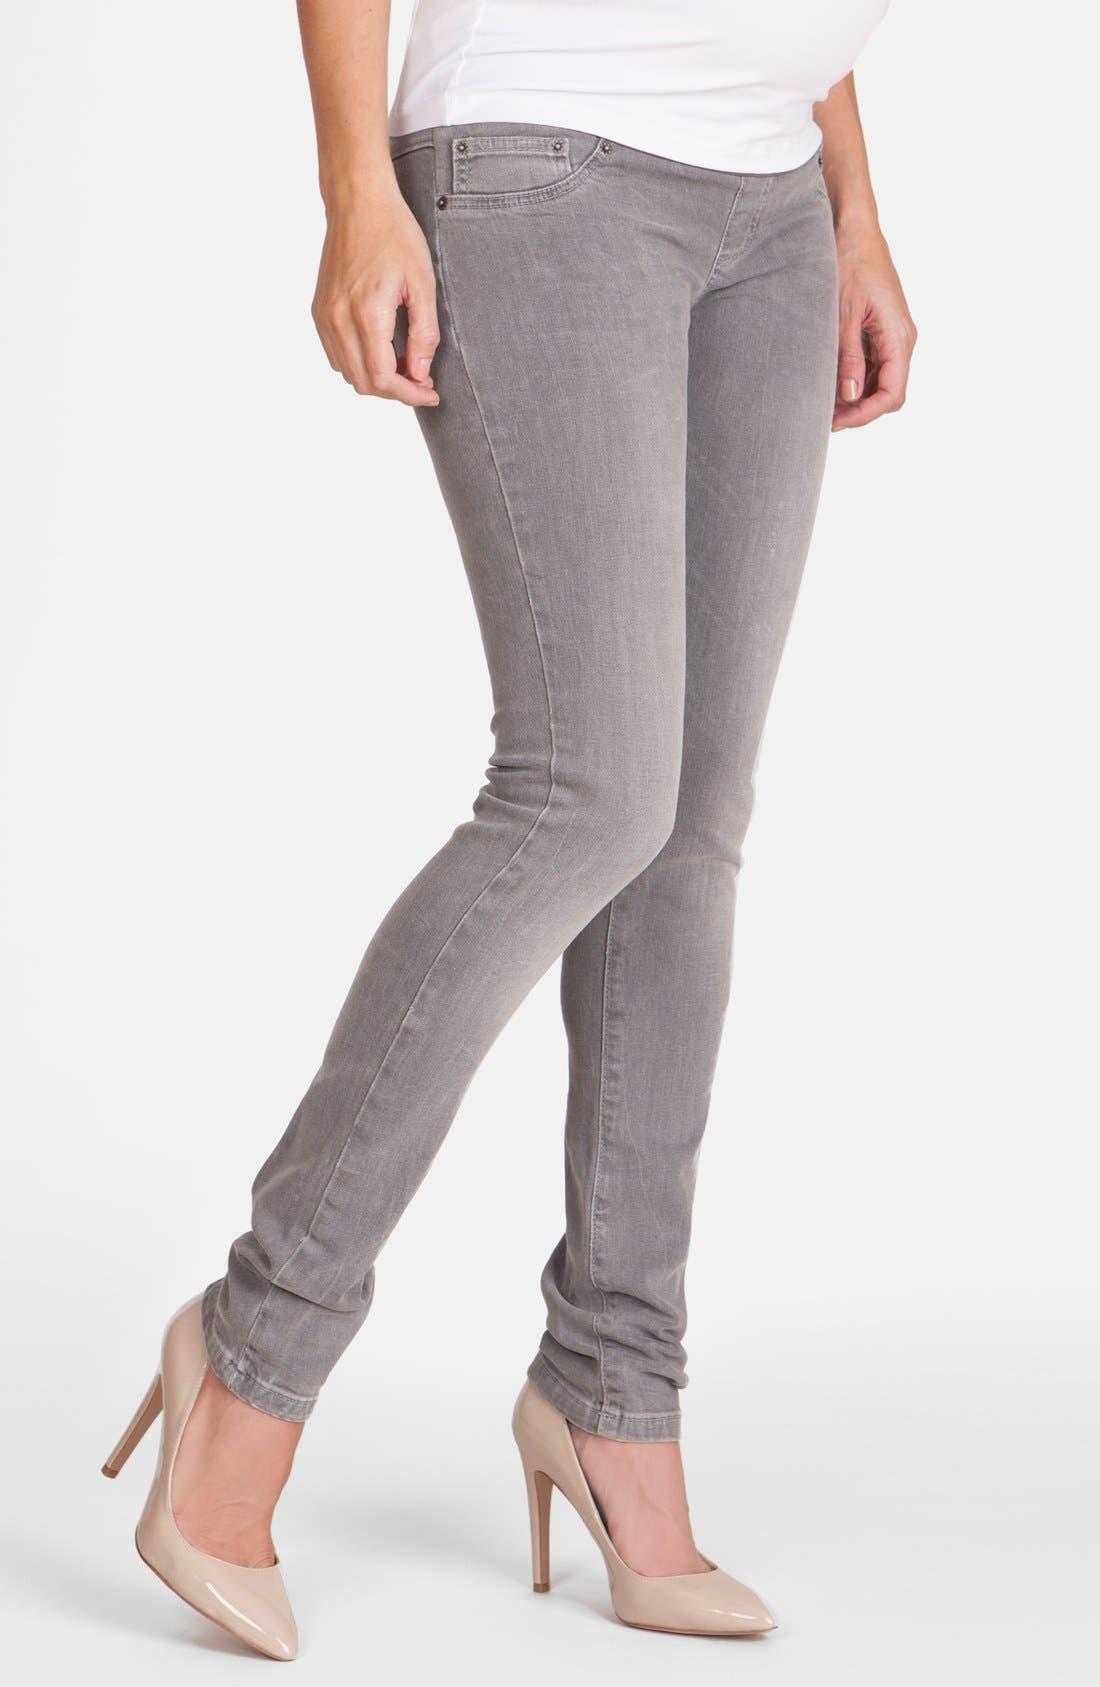 Seraphine 'Angelina' Skinny Maternity Jeans